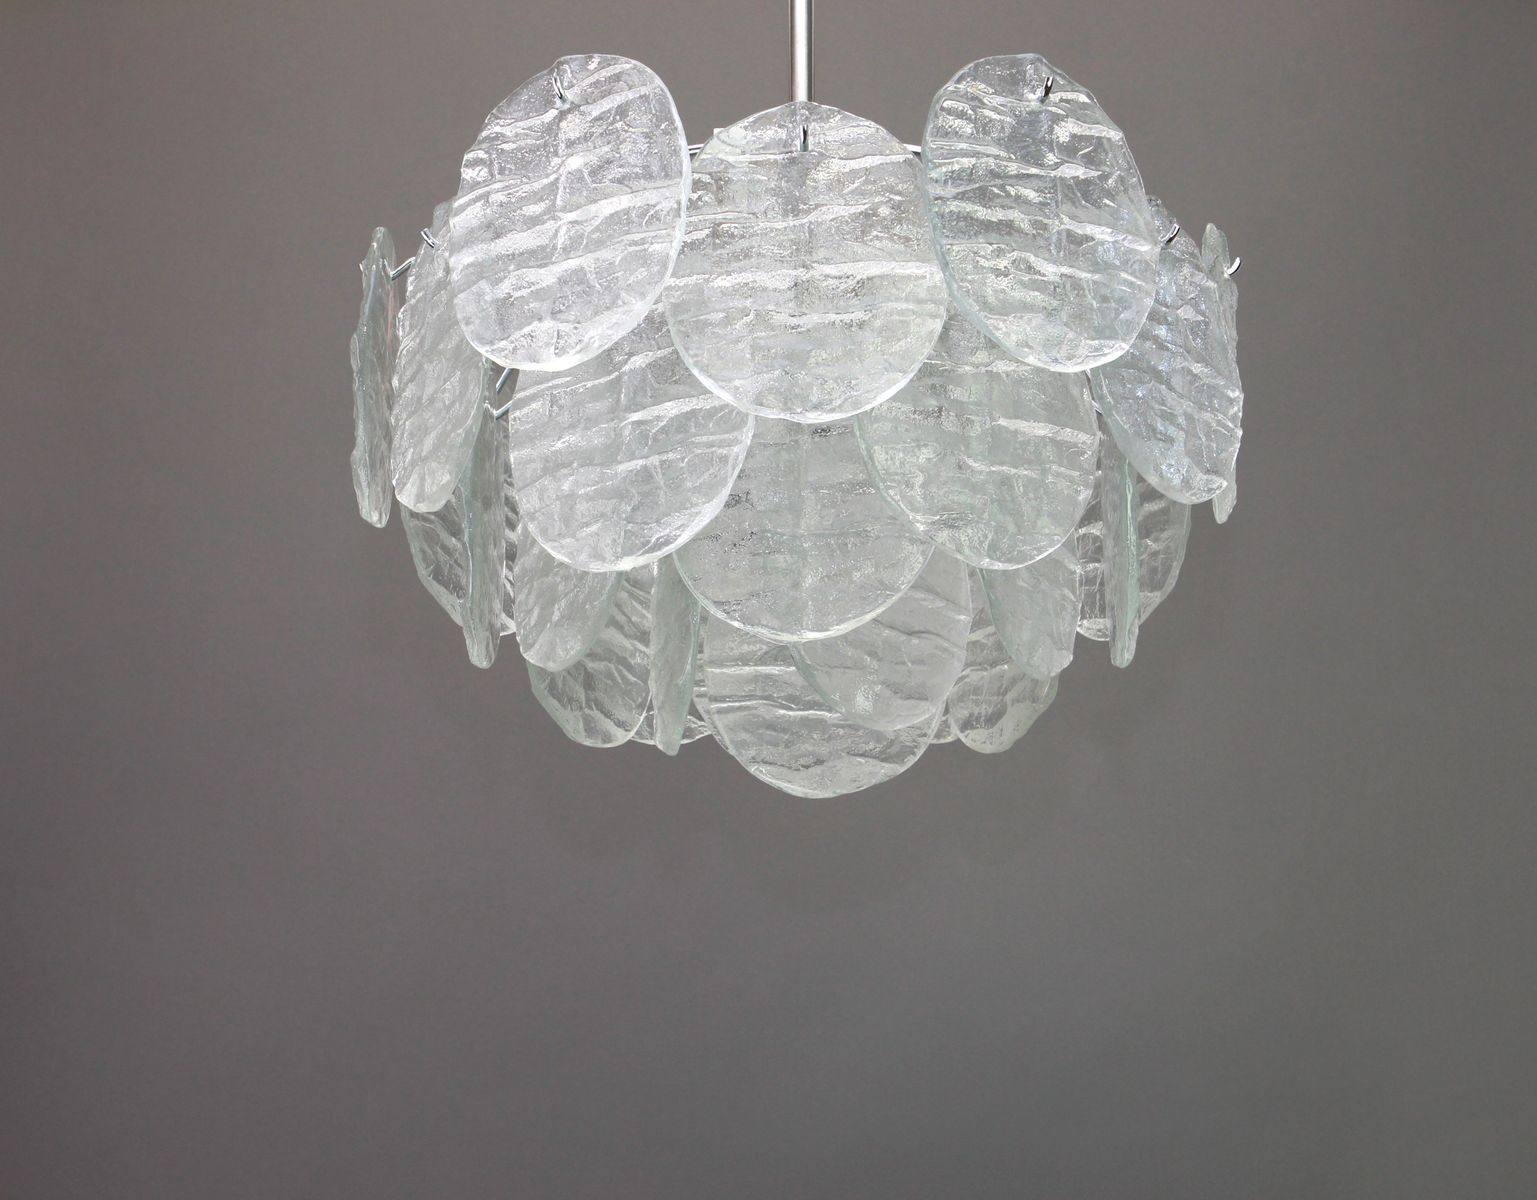 Kronleuchter Murano ~ Gigliola murano glas kronleuchter murano glass chandeliers